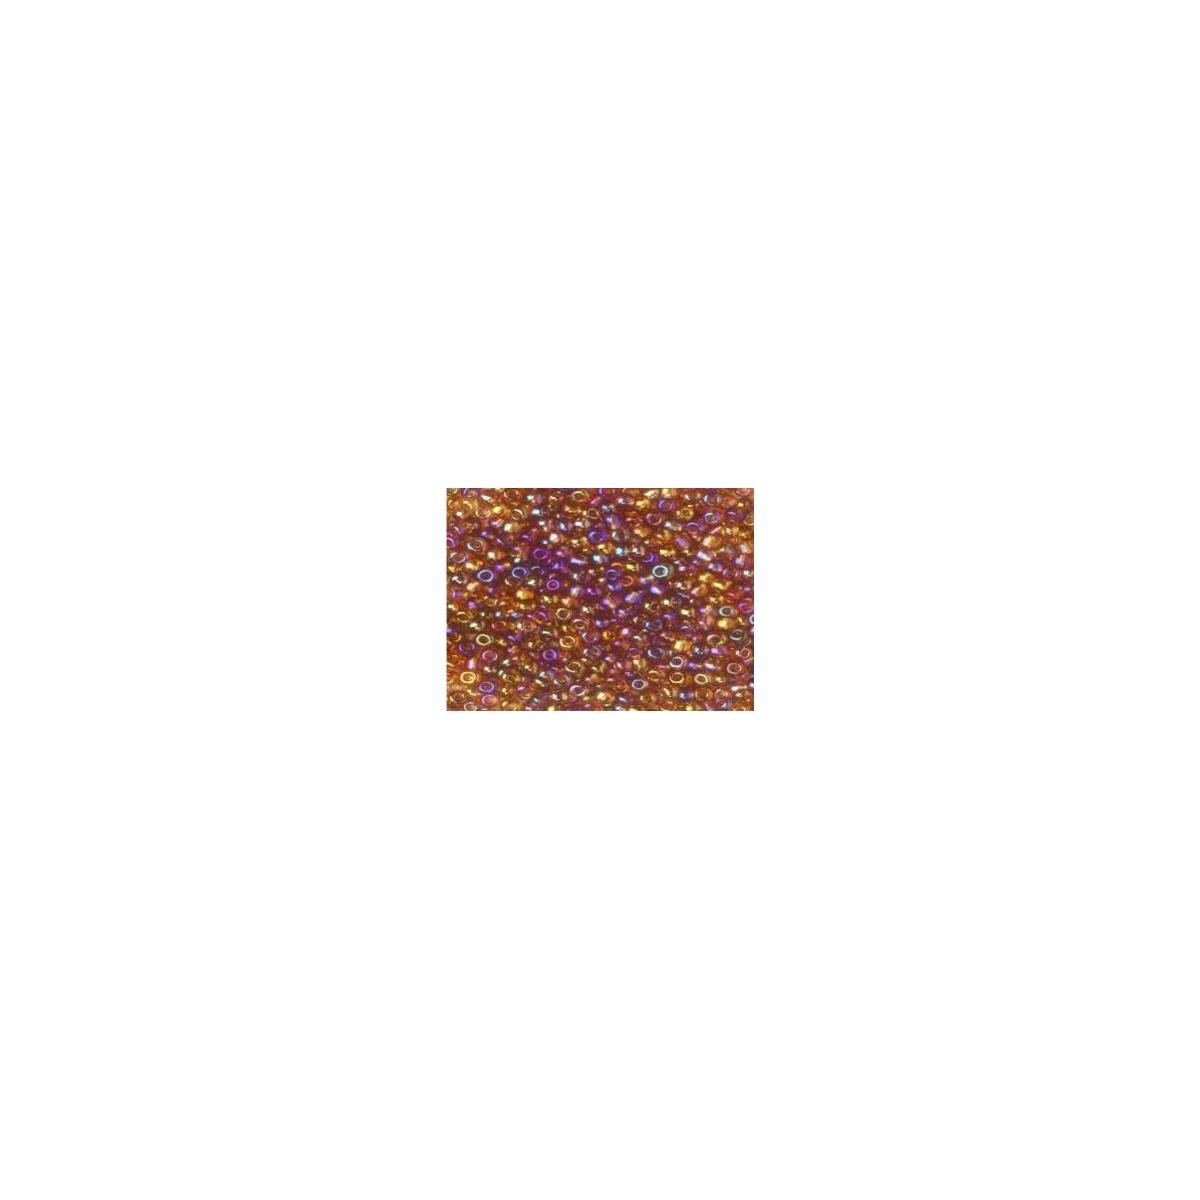 Rocalla nº 1 - Marron Transparente AB